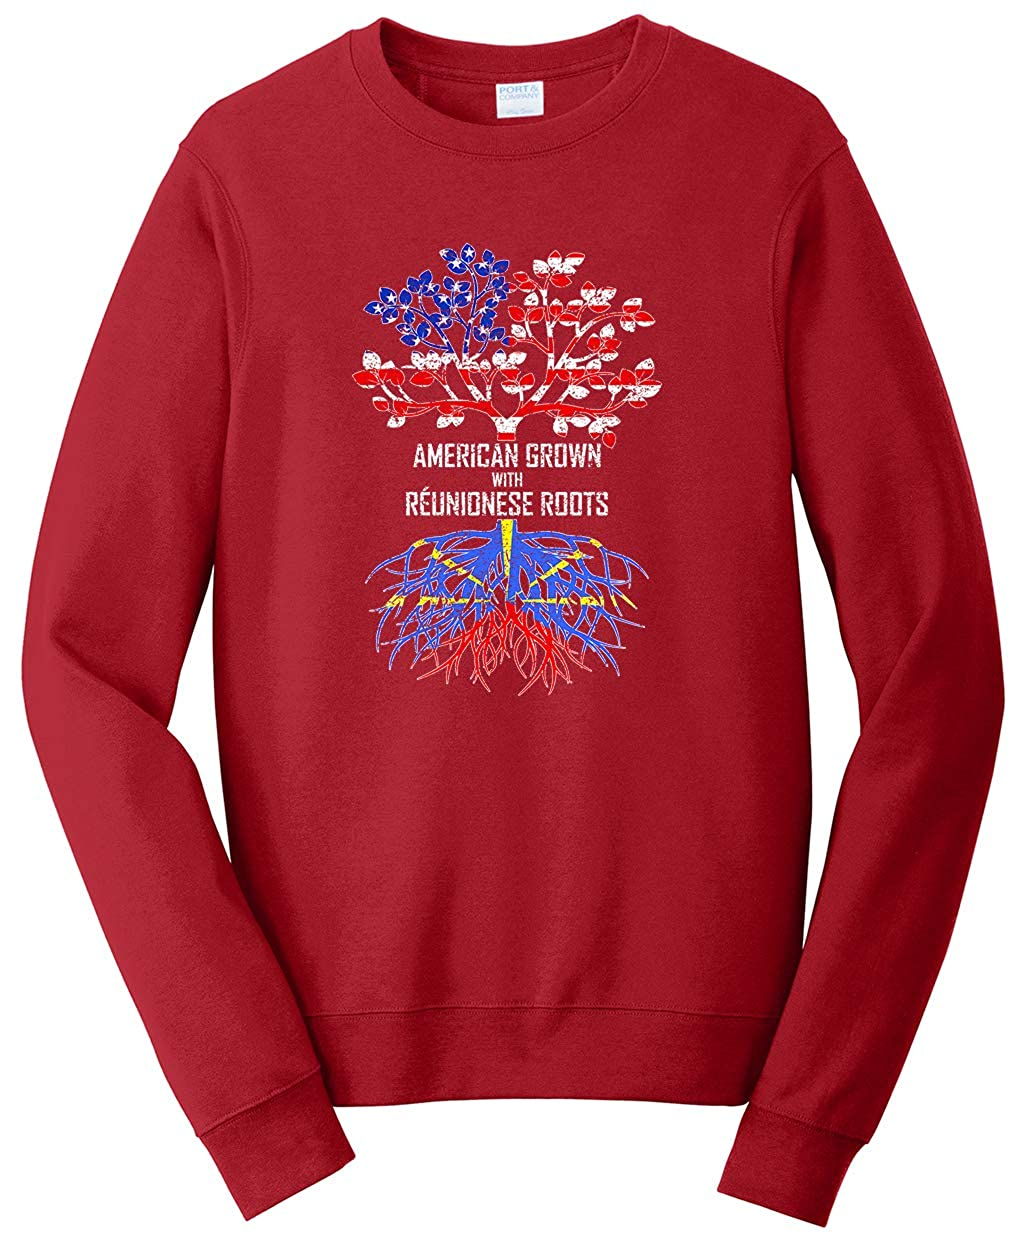 Tenacitee Unisex American Grown with R/éunionese Roots Sweatshirt